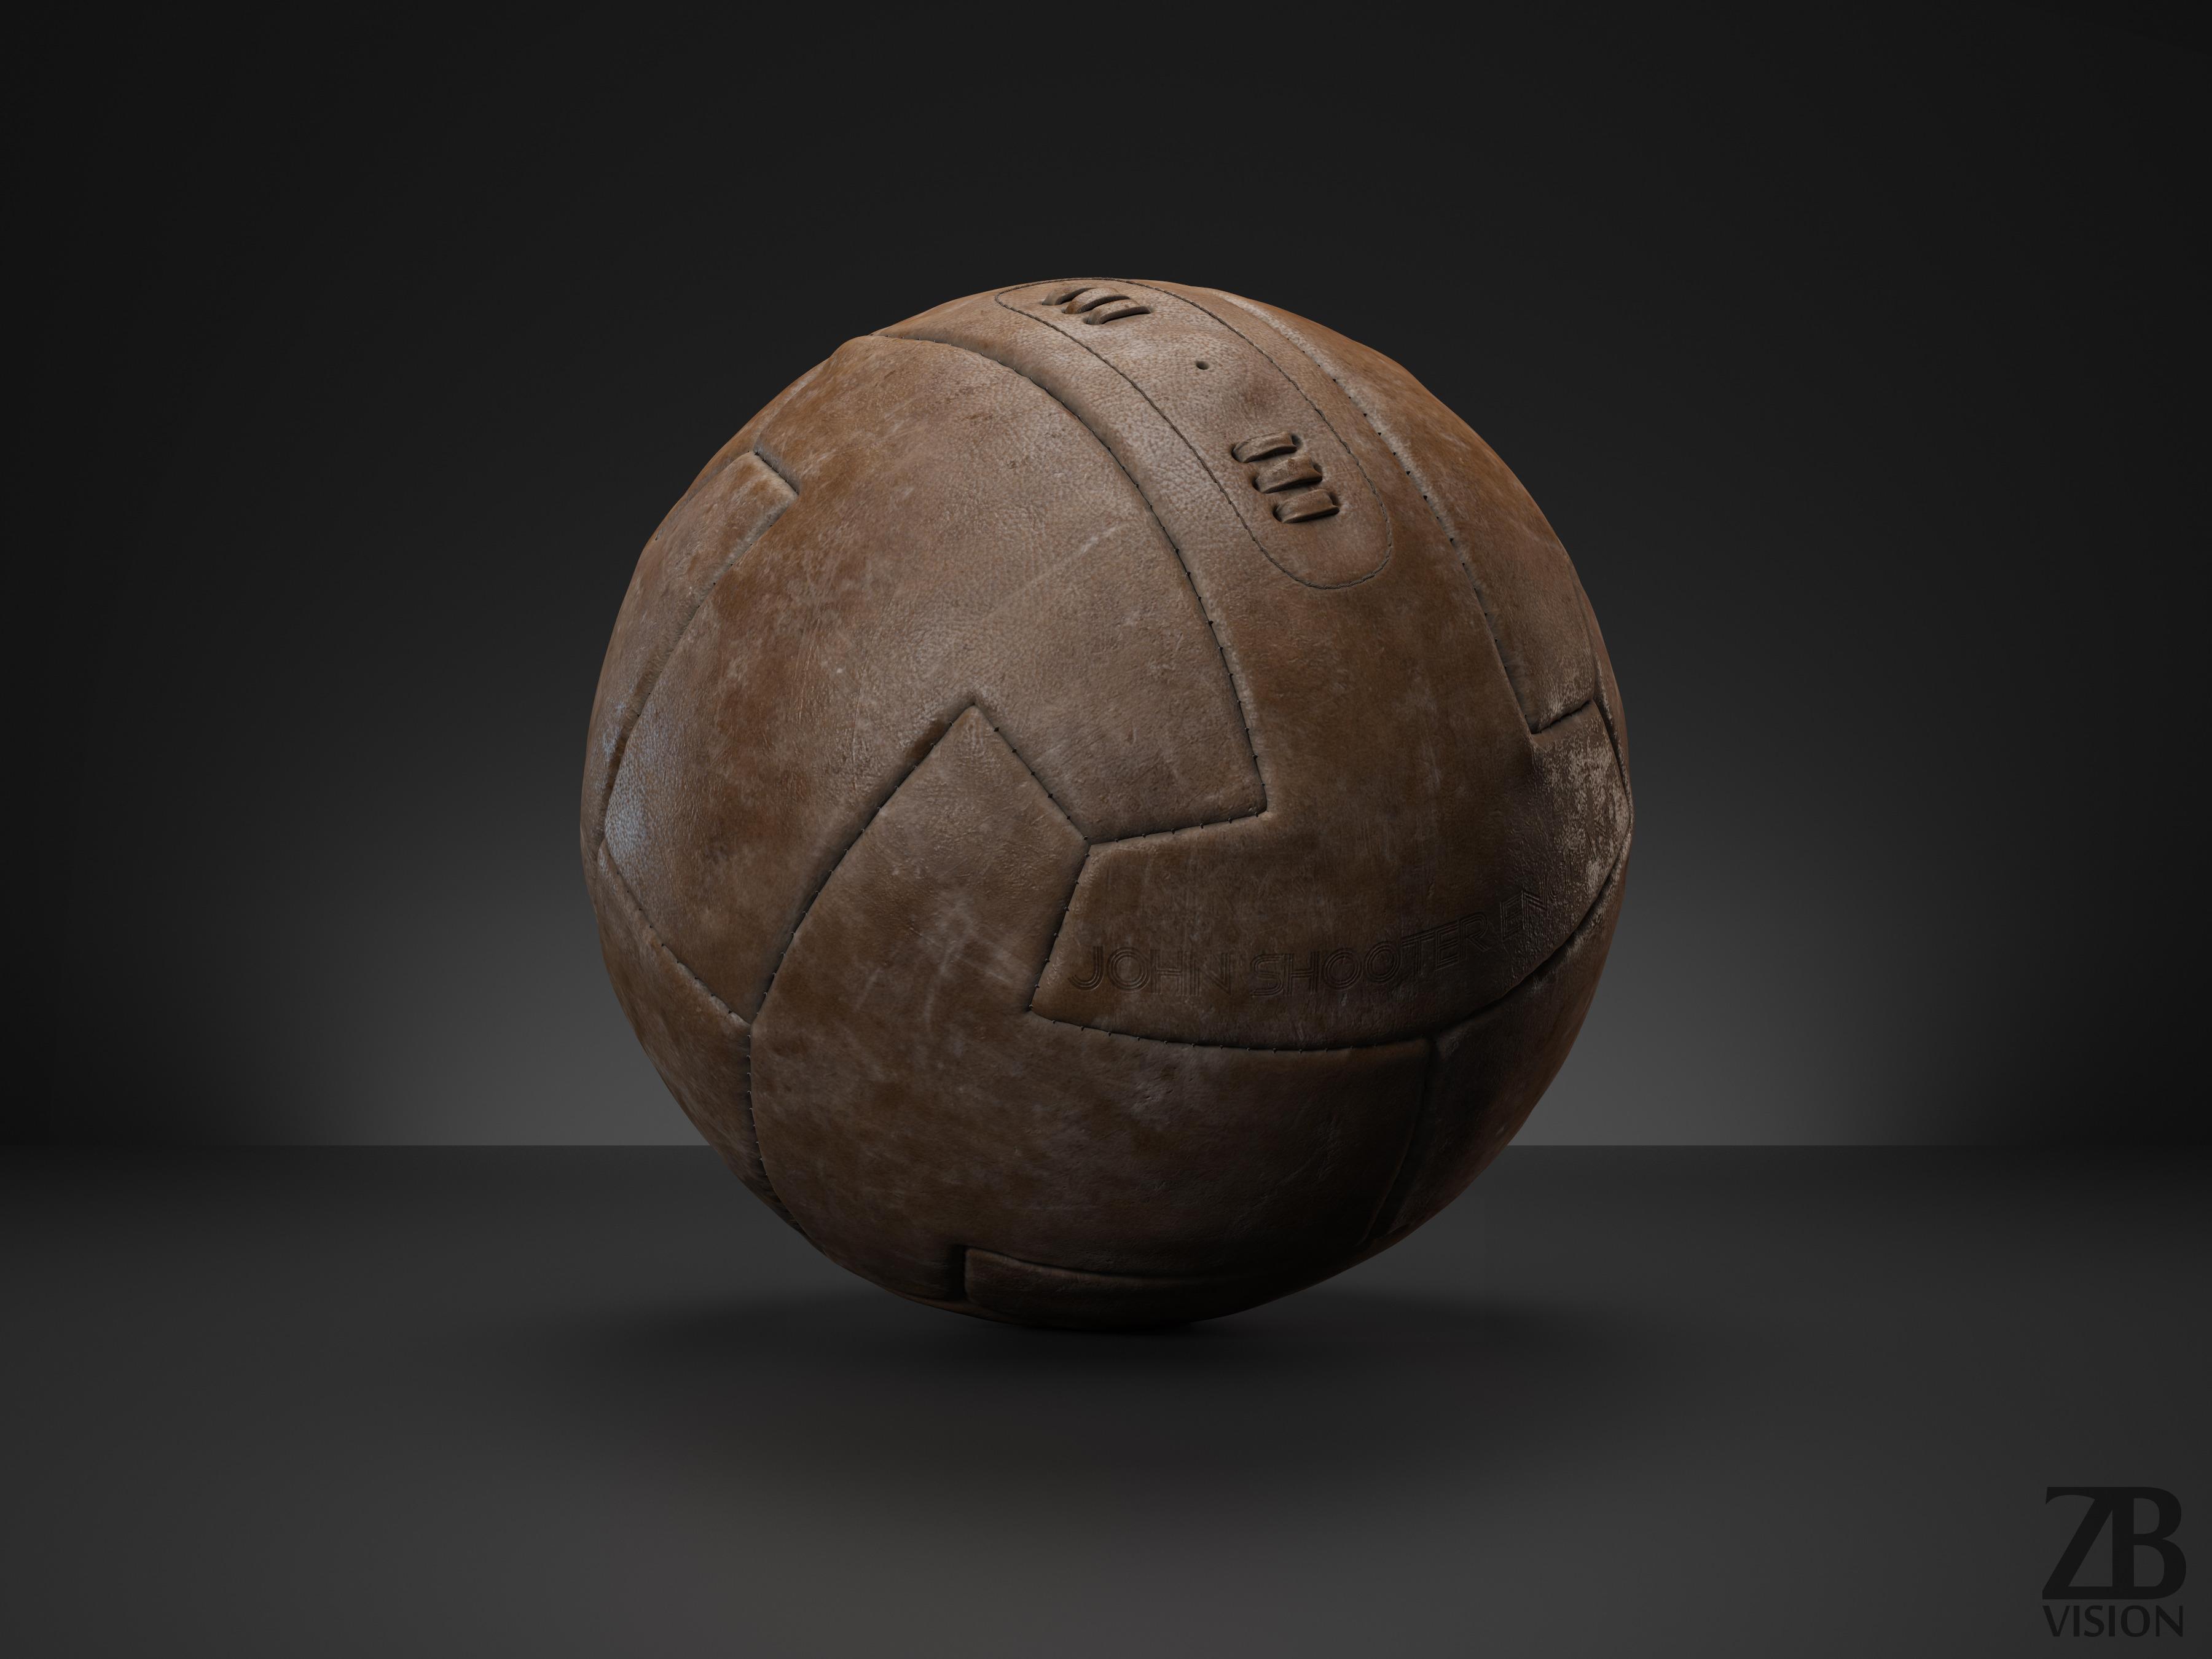 Vintage Soccer Ball 52